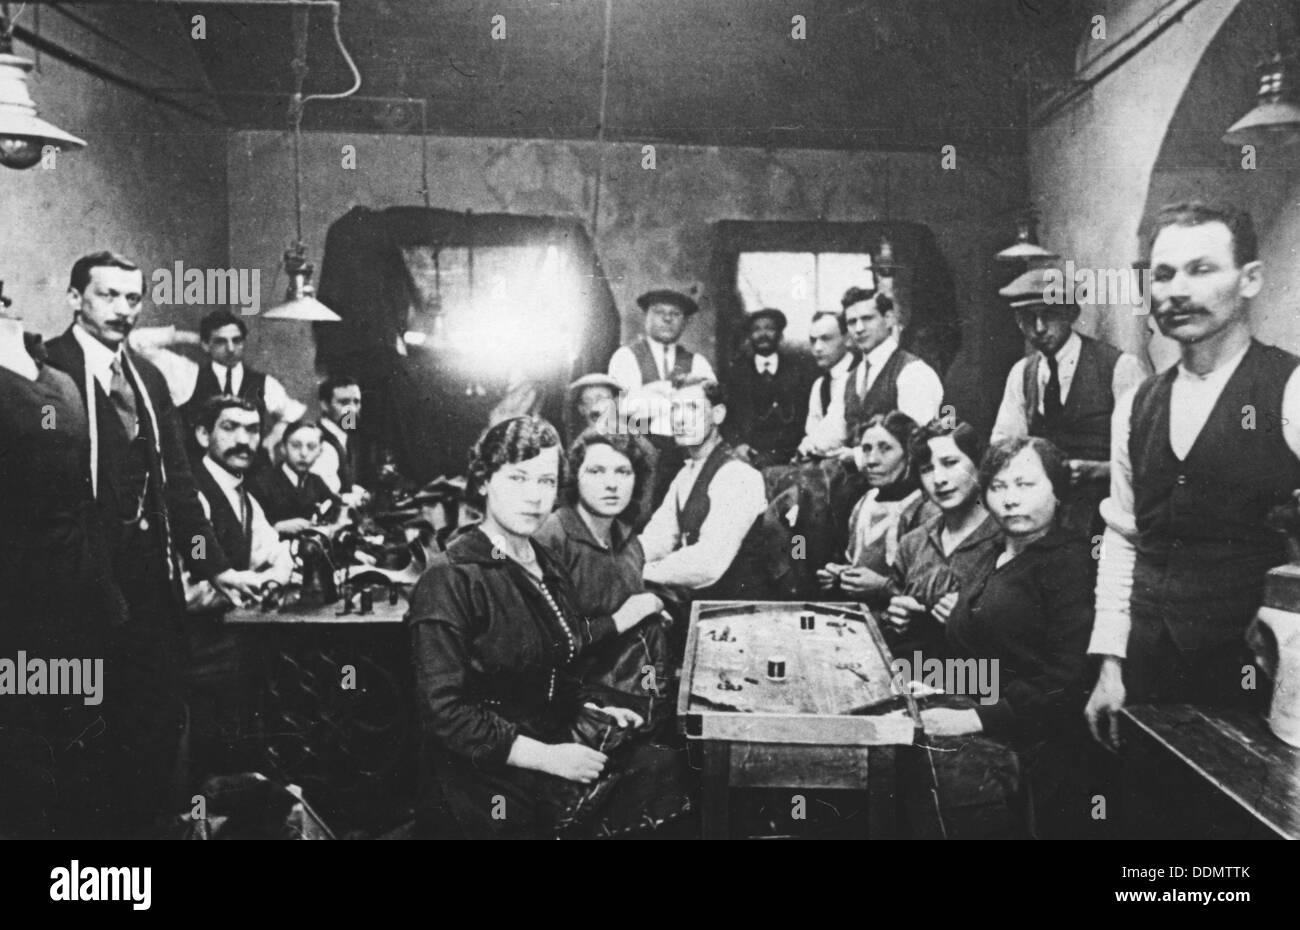 Sweatshop, East End of London, c1920s. - Stock Image